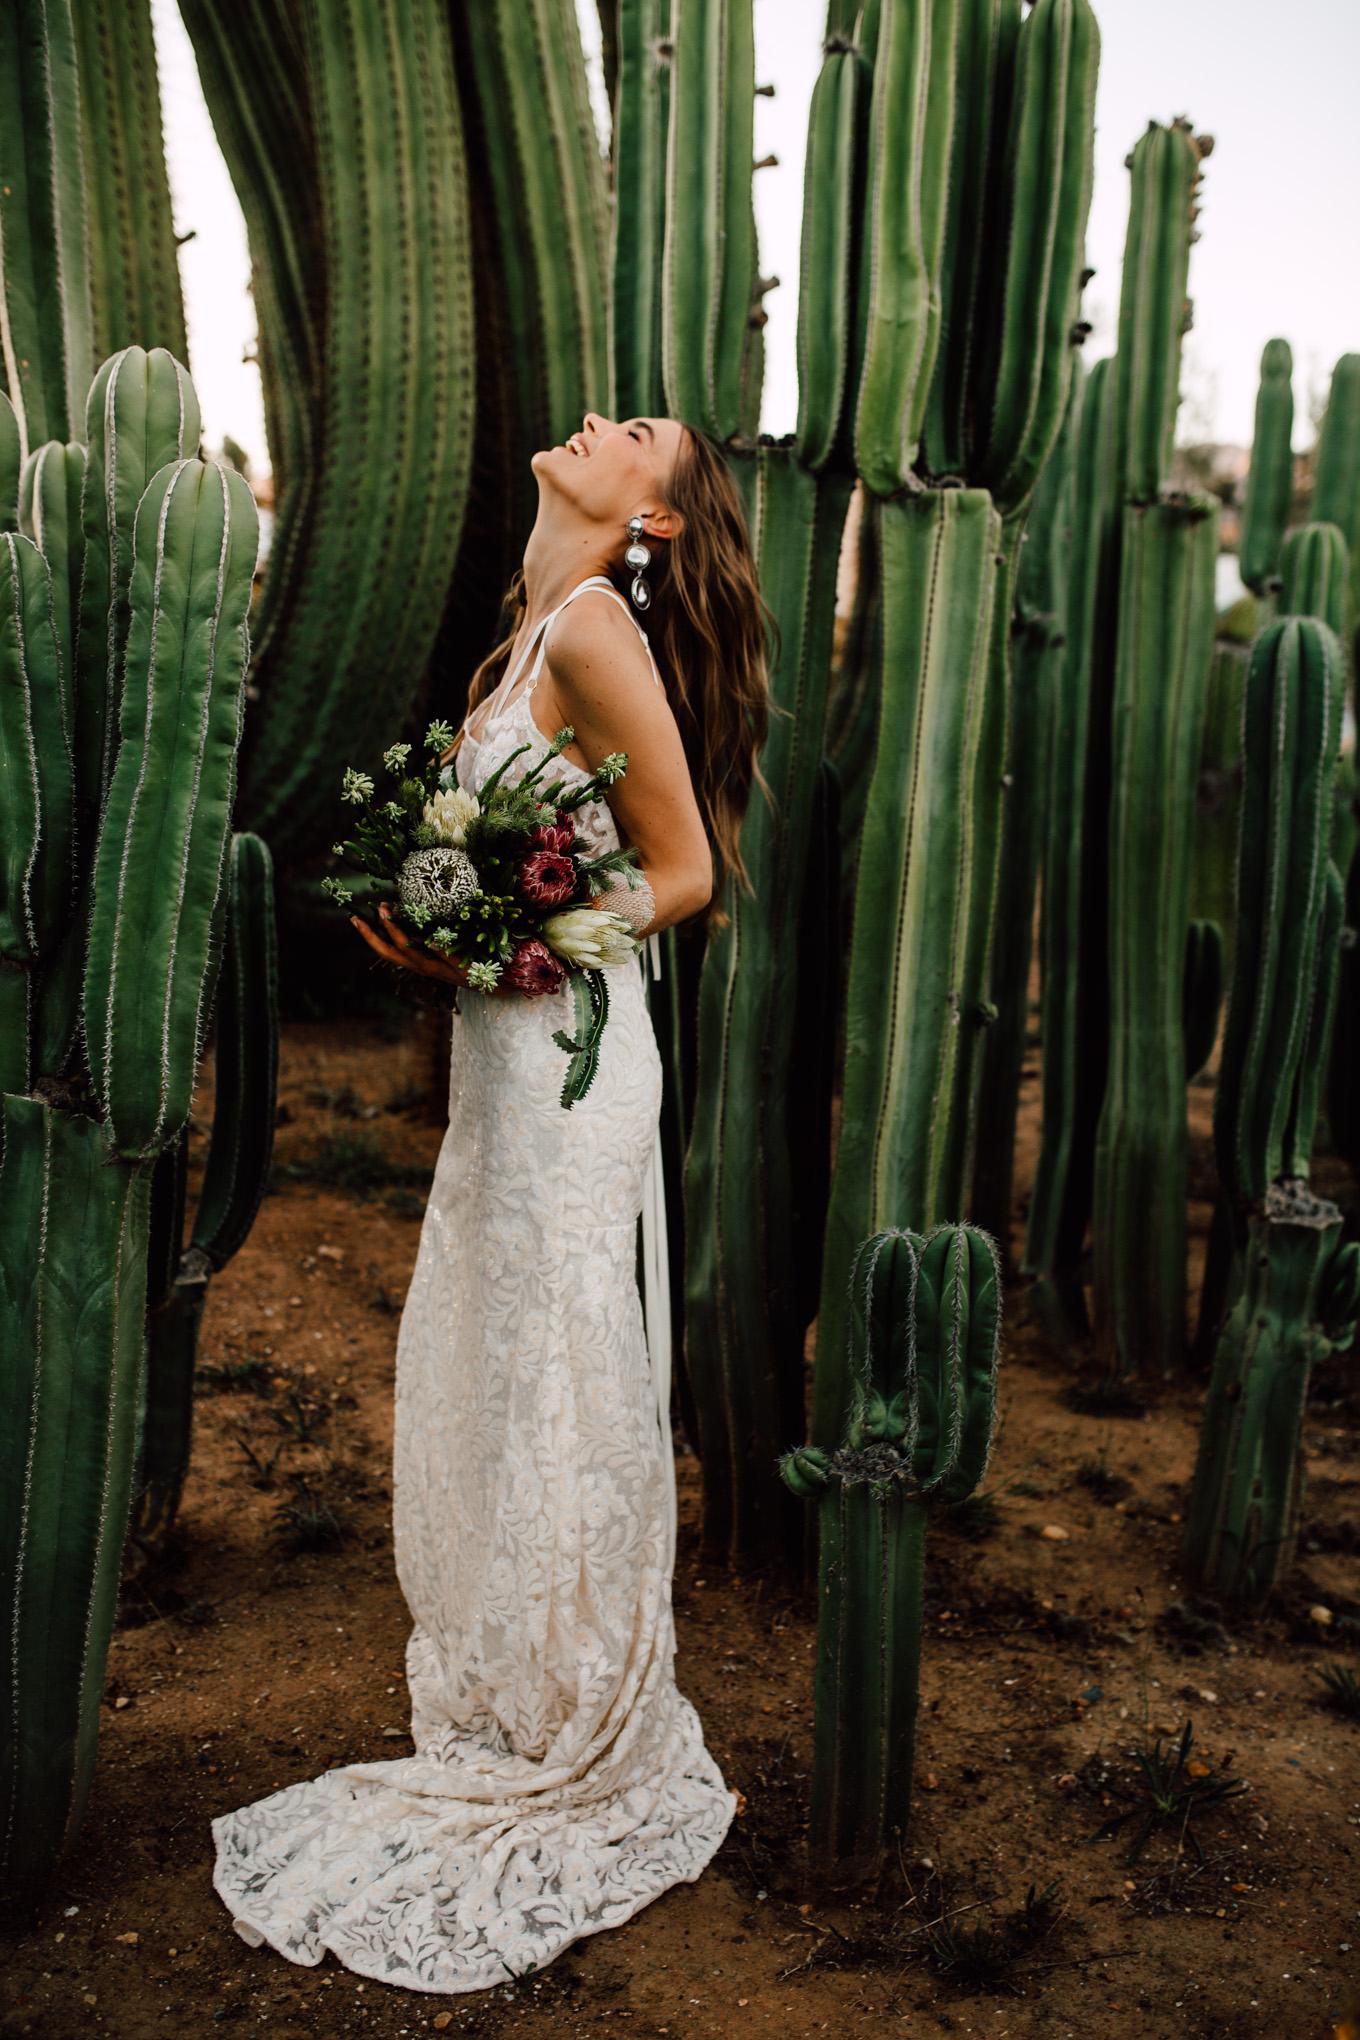 Cape-Town-Pia-Anna-Christian-Wedding-Photography-South-Africa-Bride-Cactus-15.jpg